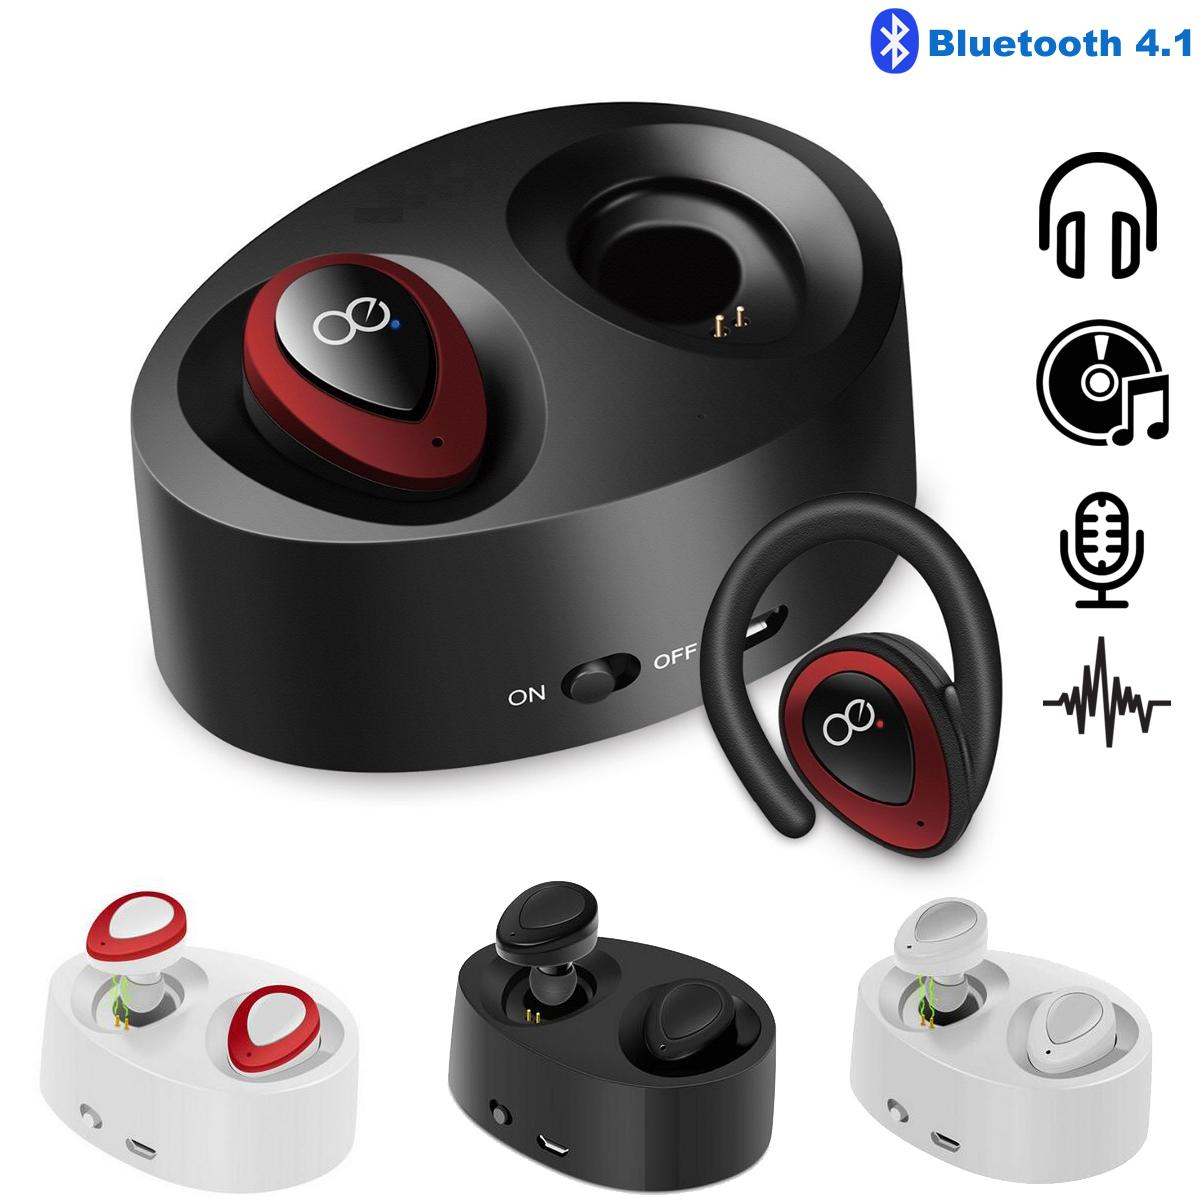 Mini TWS K2 Wireless Twins Bluetooth Estéreo Auricular Auricular Auricular Auricular con conector de carga Auriculares